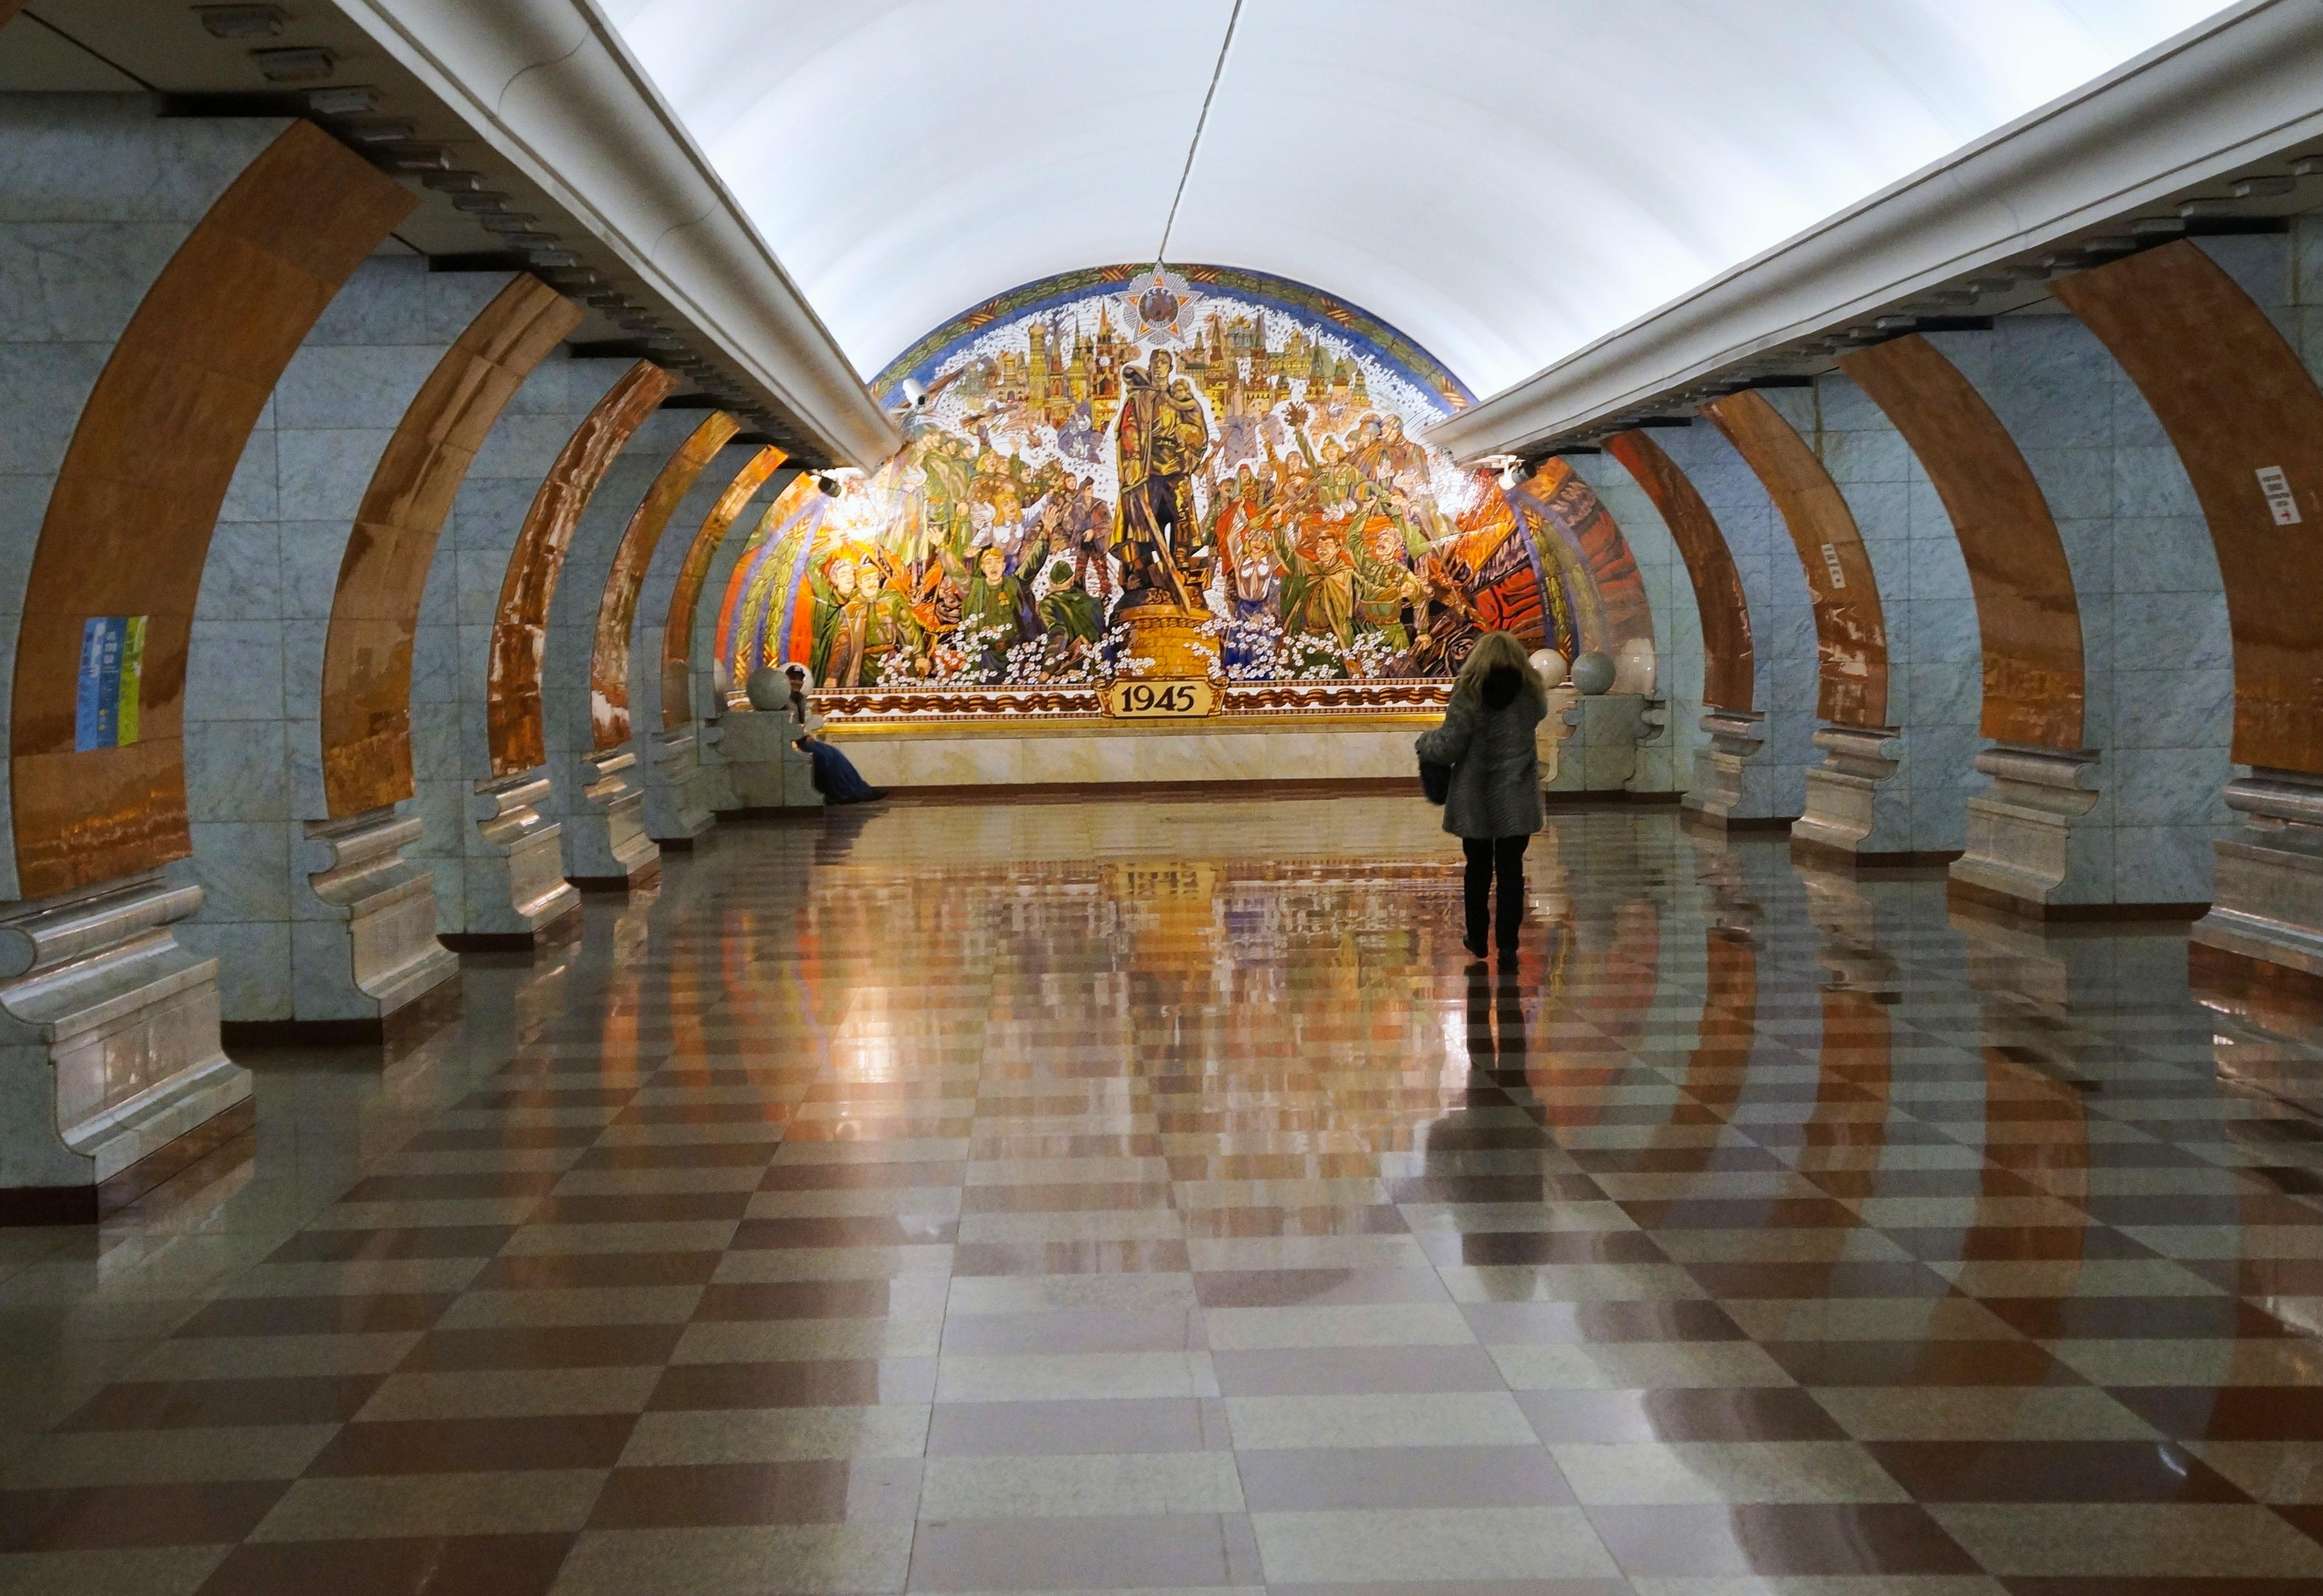 Ремонт станций метро в москве фото